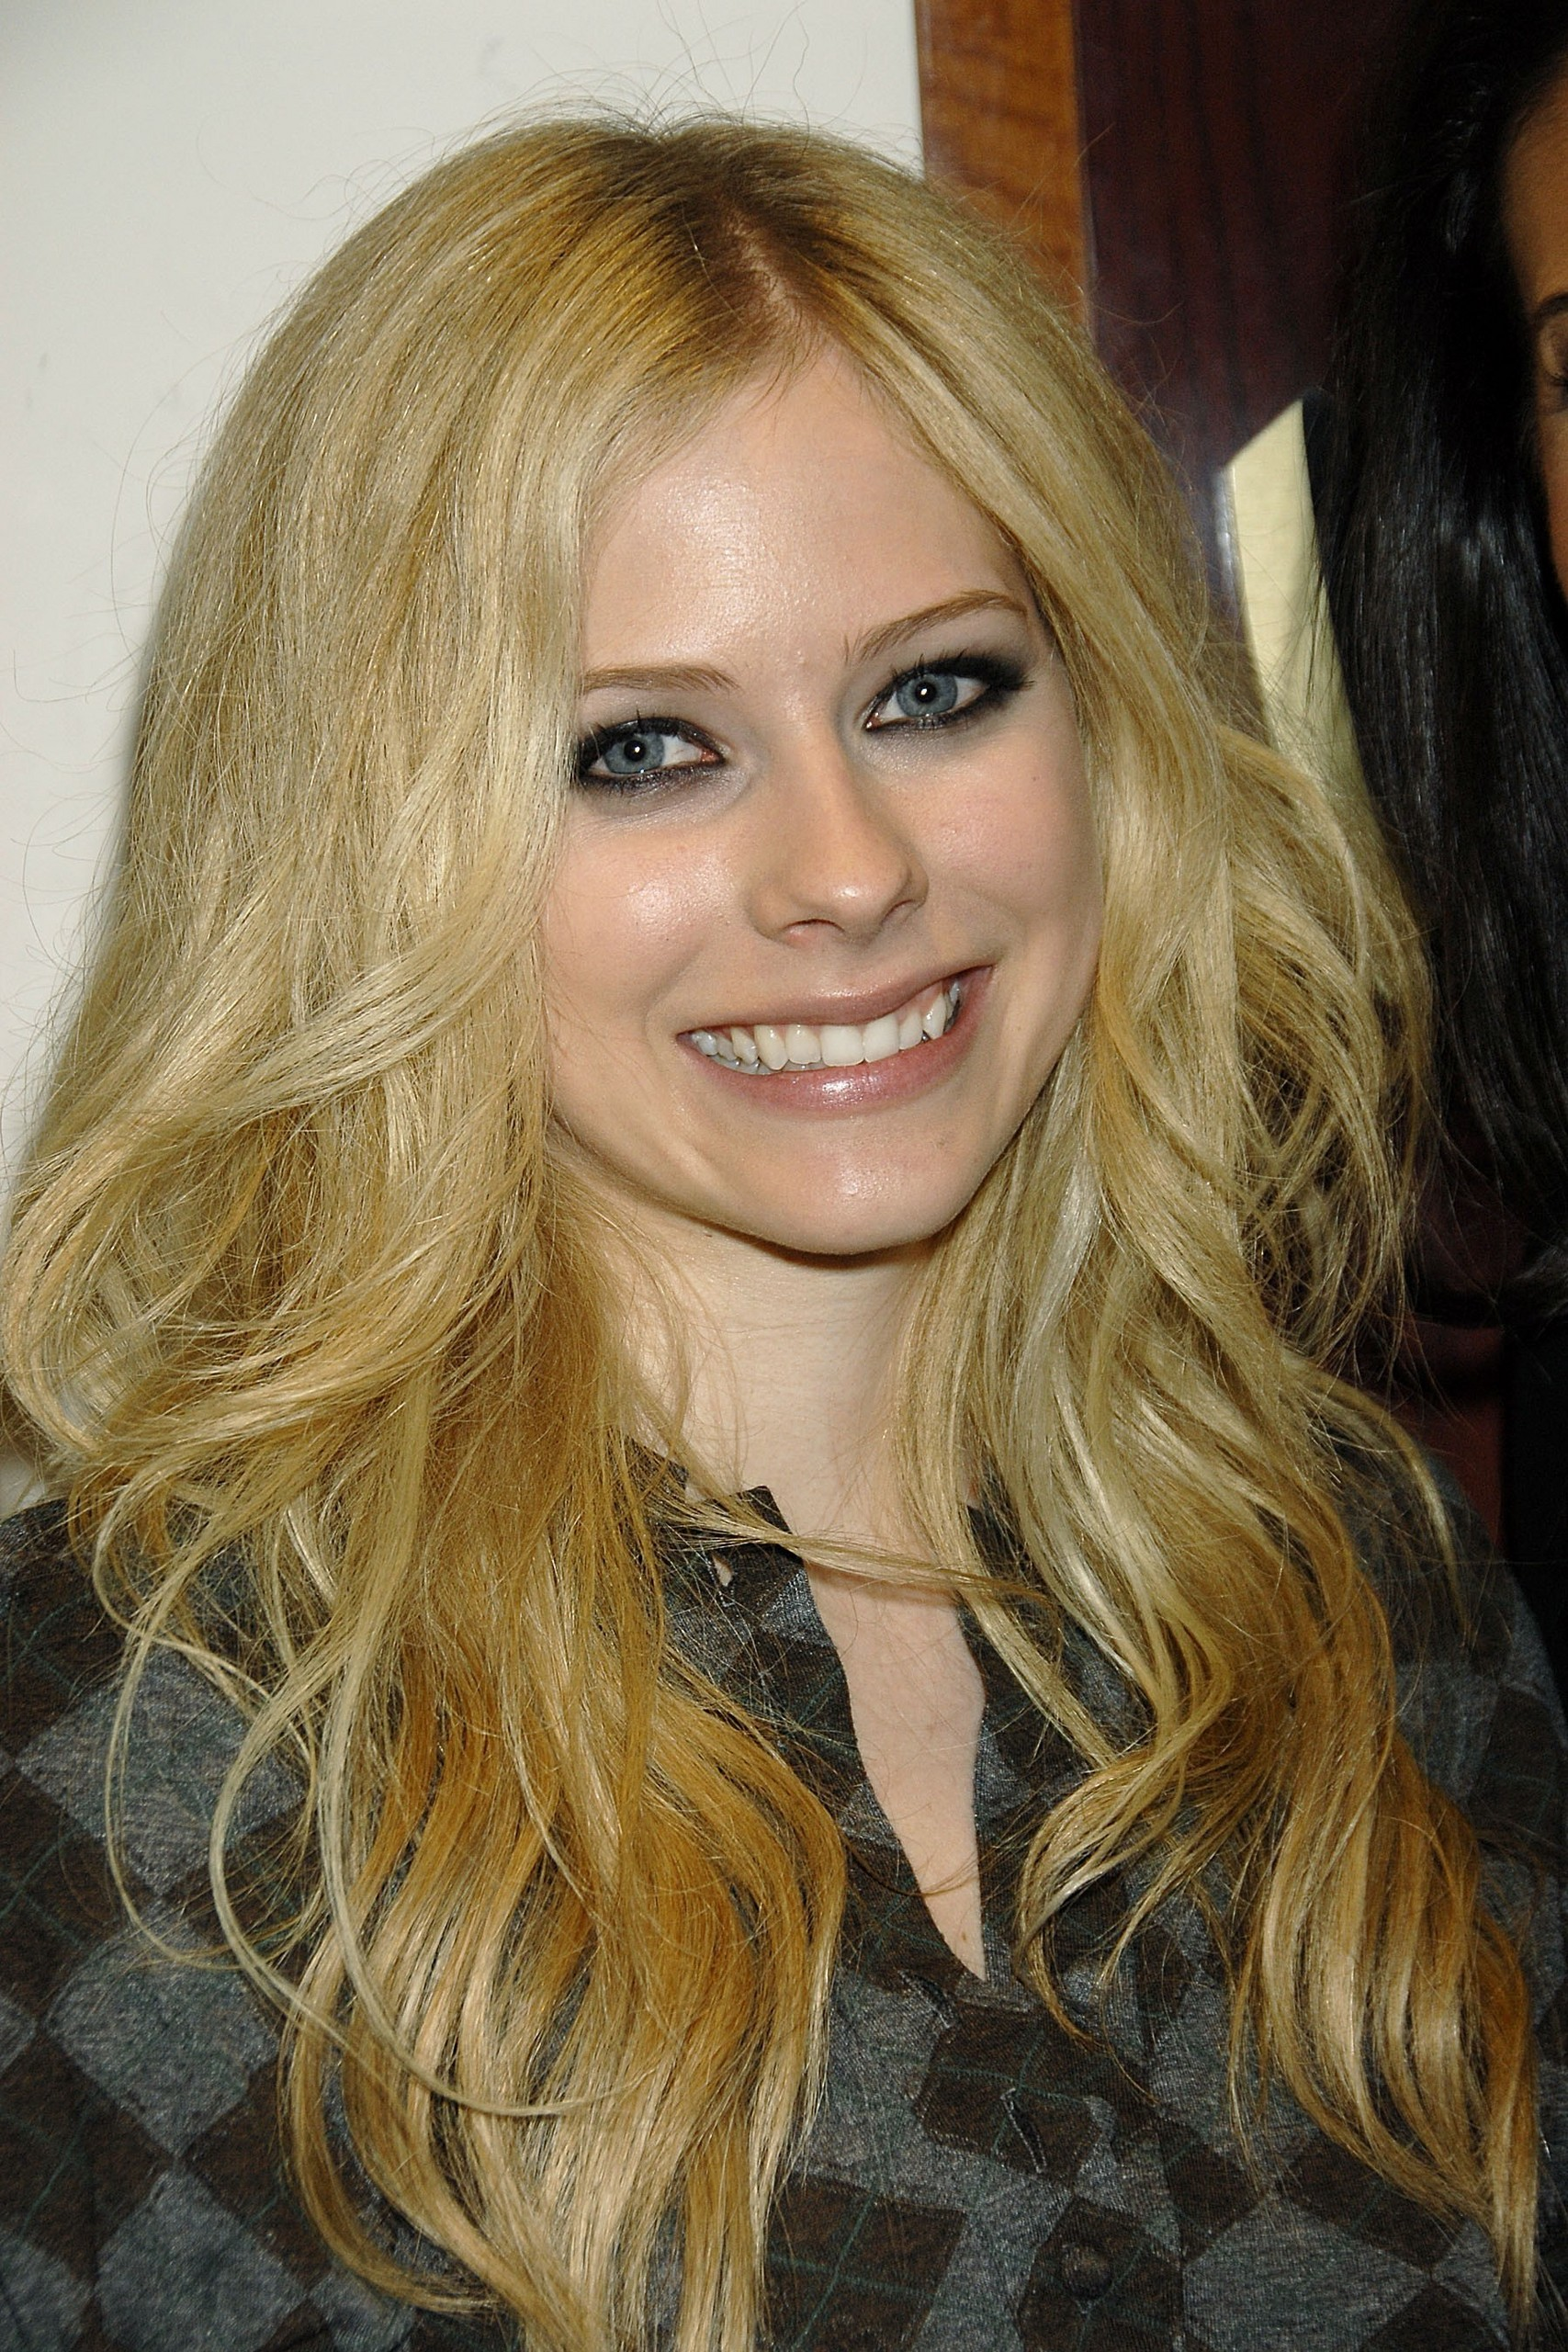 Avril Lavigne - Avril Lavigne Photo (5880849) - Fanpop Avril Lavigne